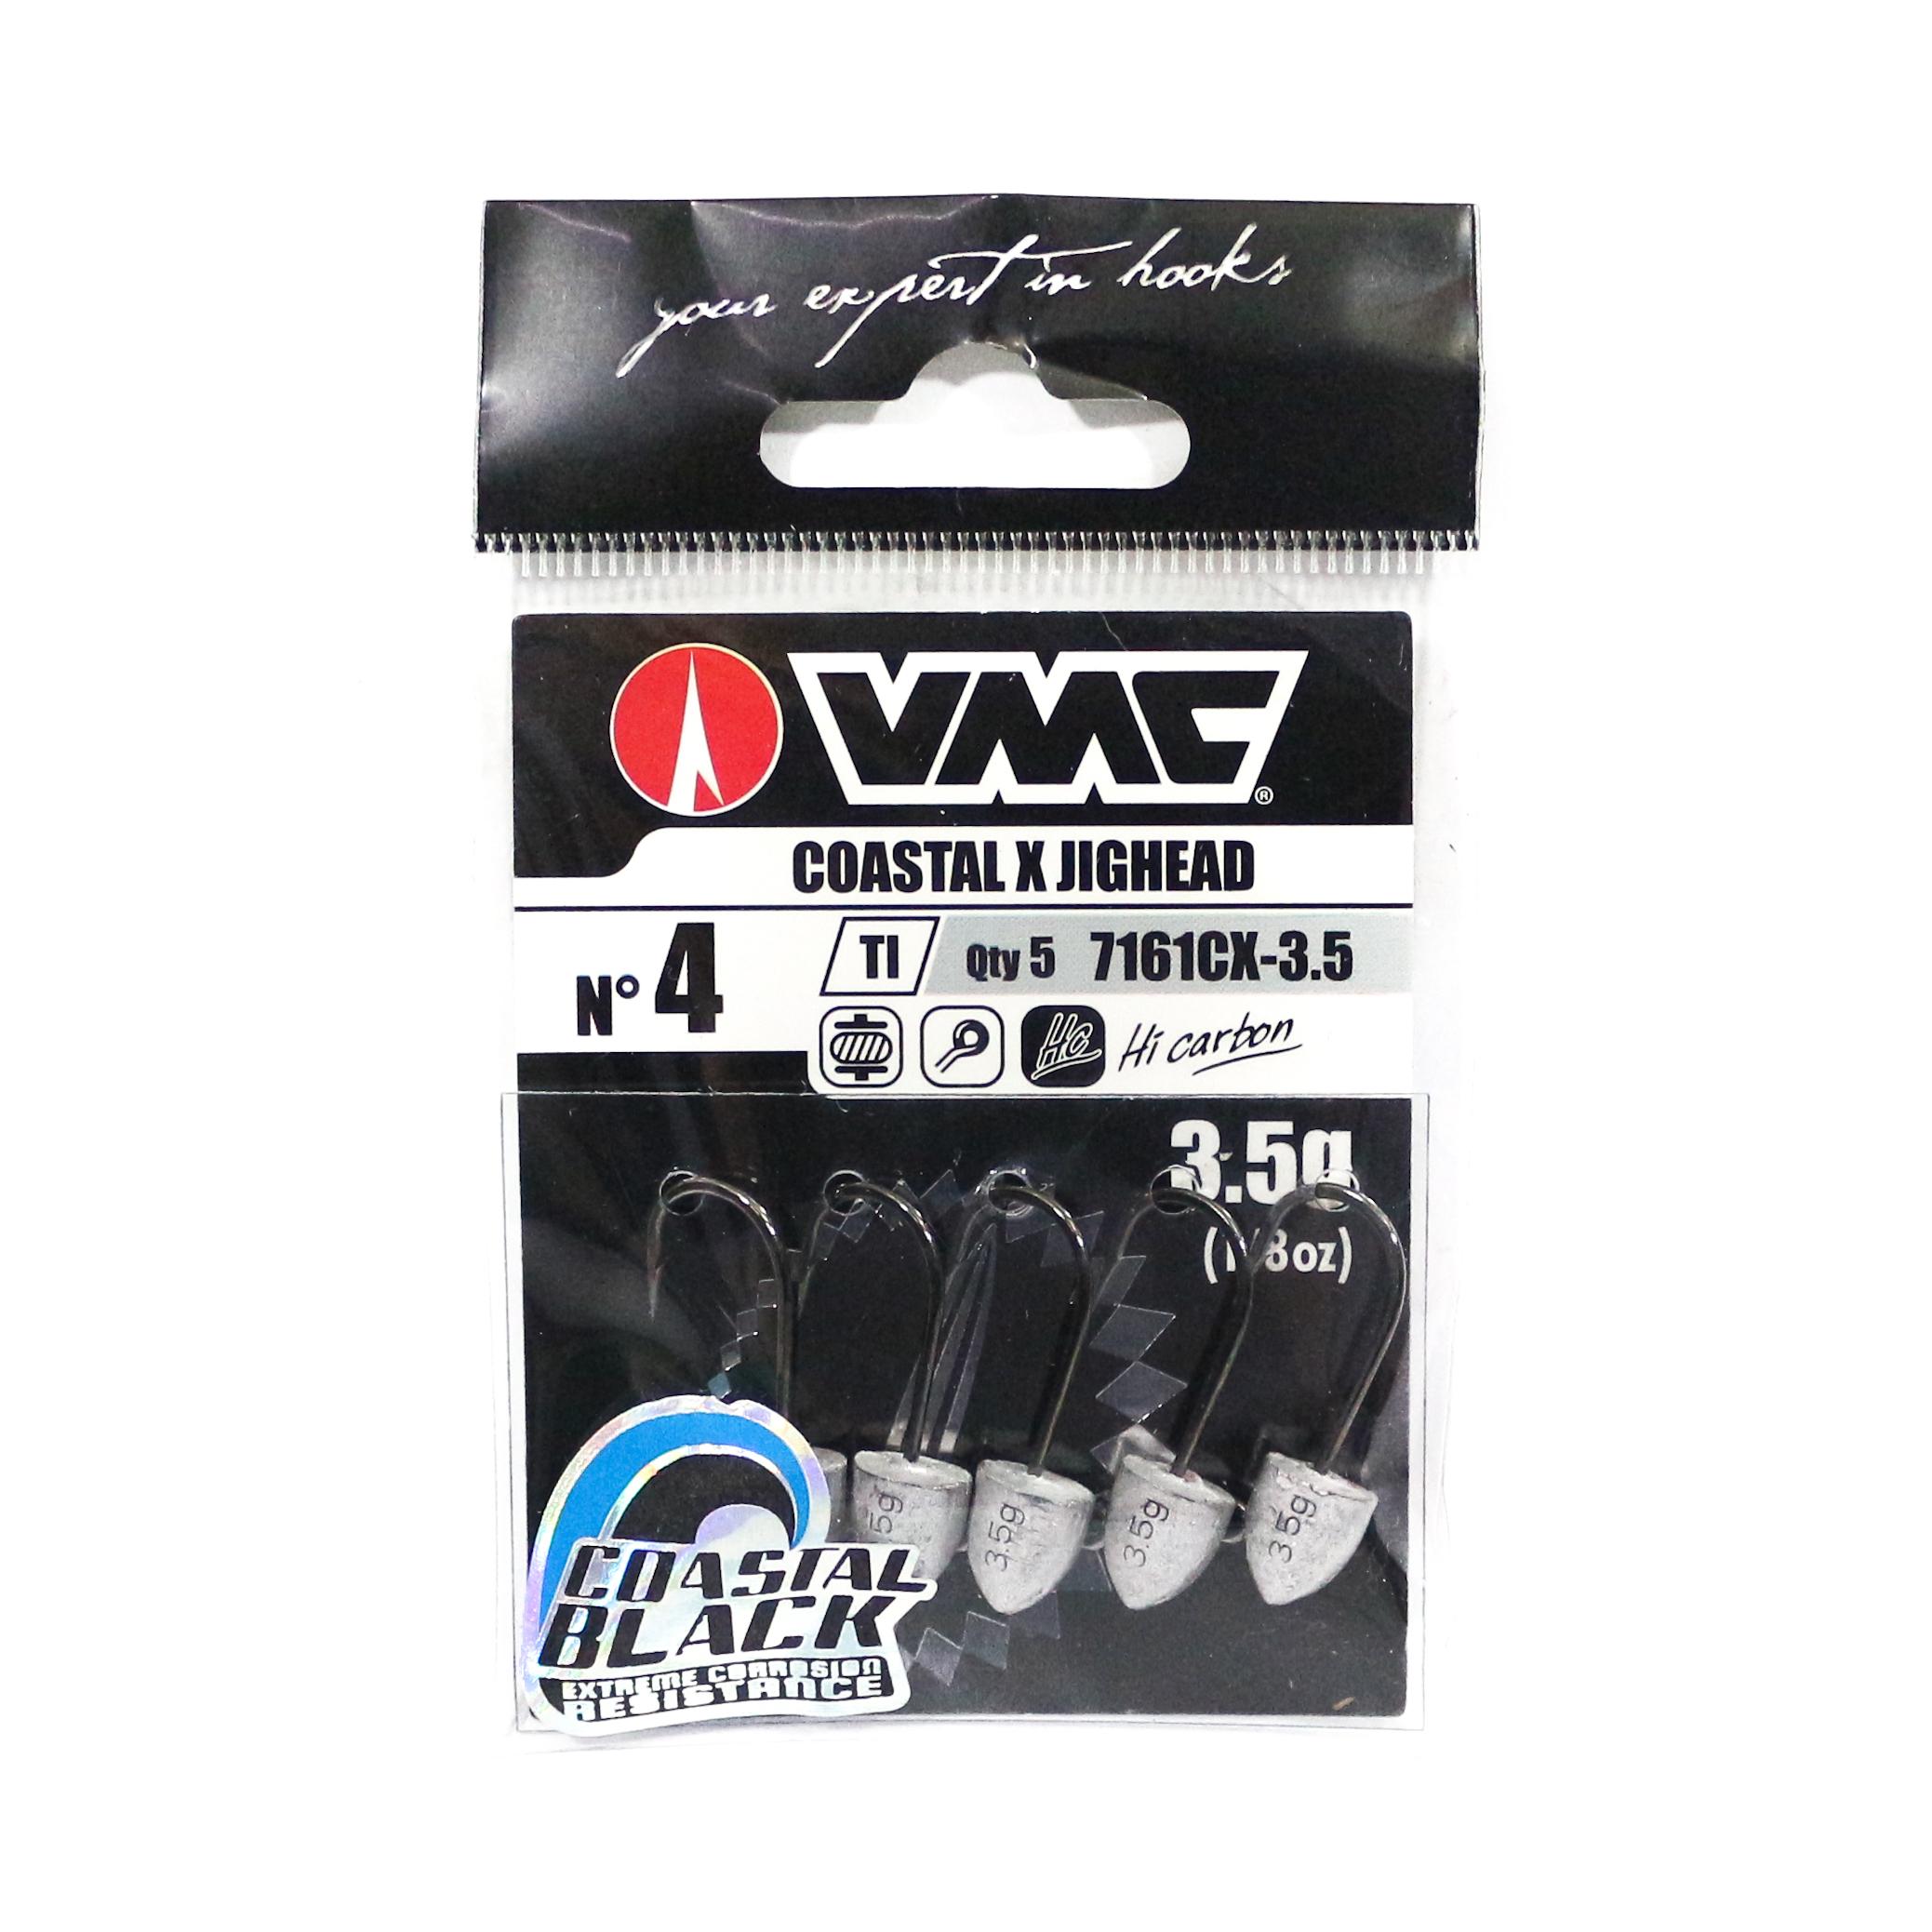 Rapala VMC V7161CX-3.5 Coastal X Jighead Size 4 , 3.5 grams 5 per pack (1062)